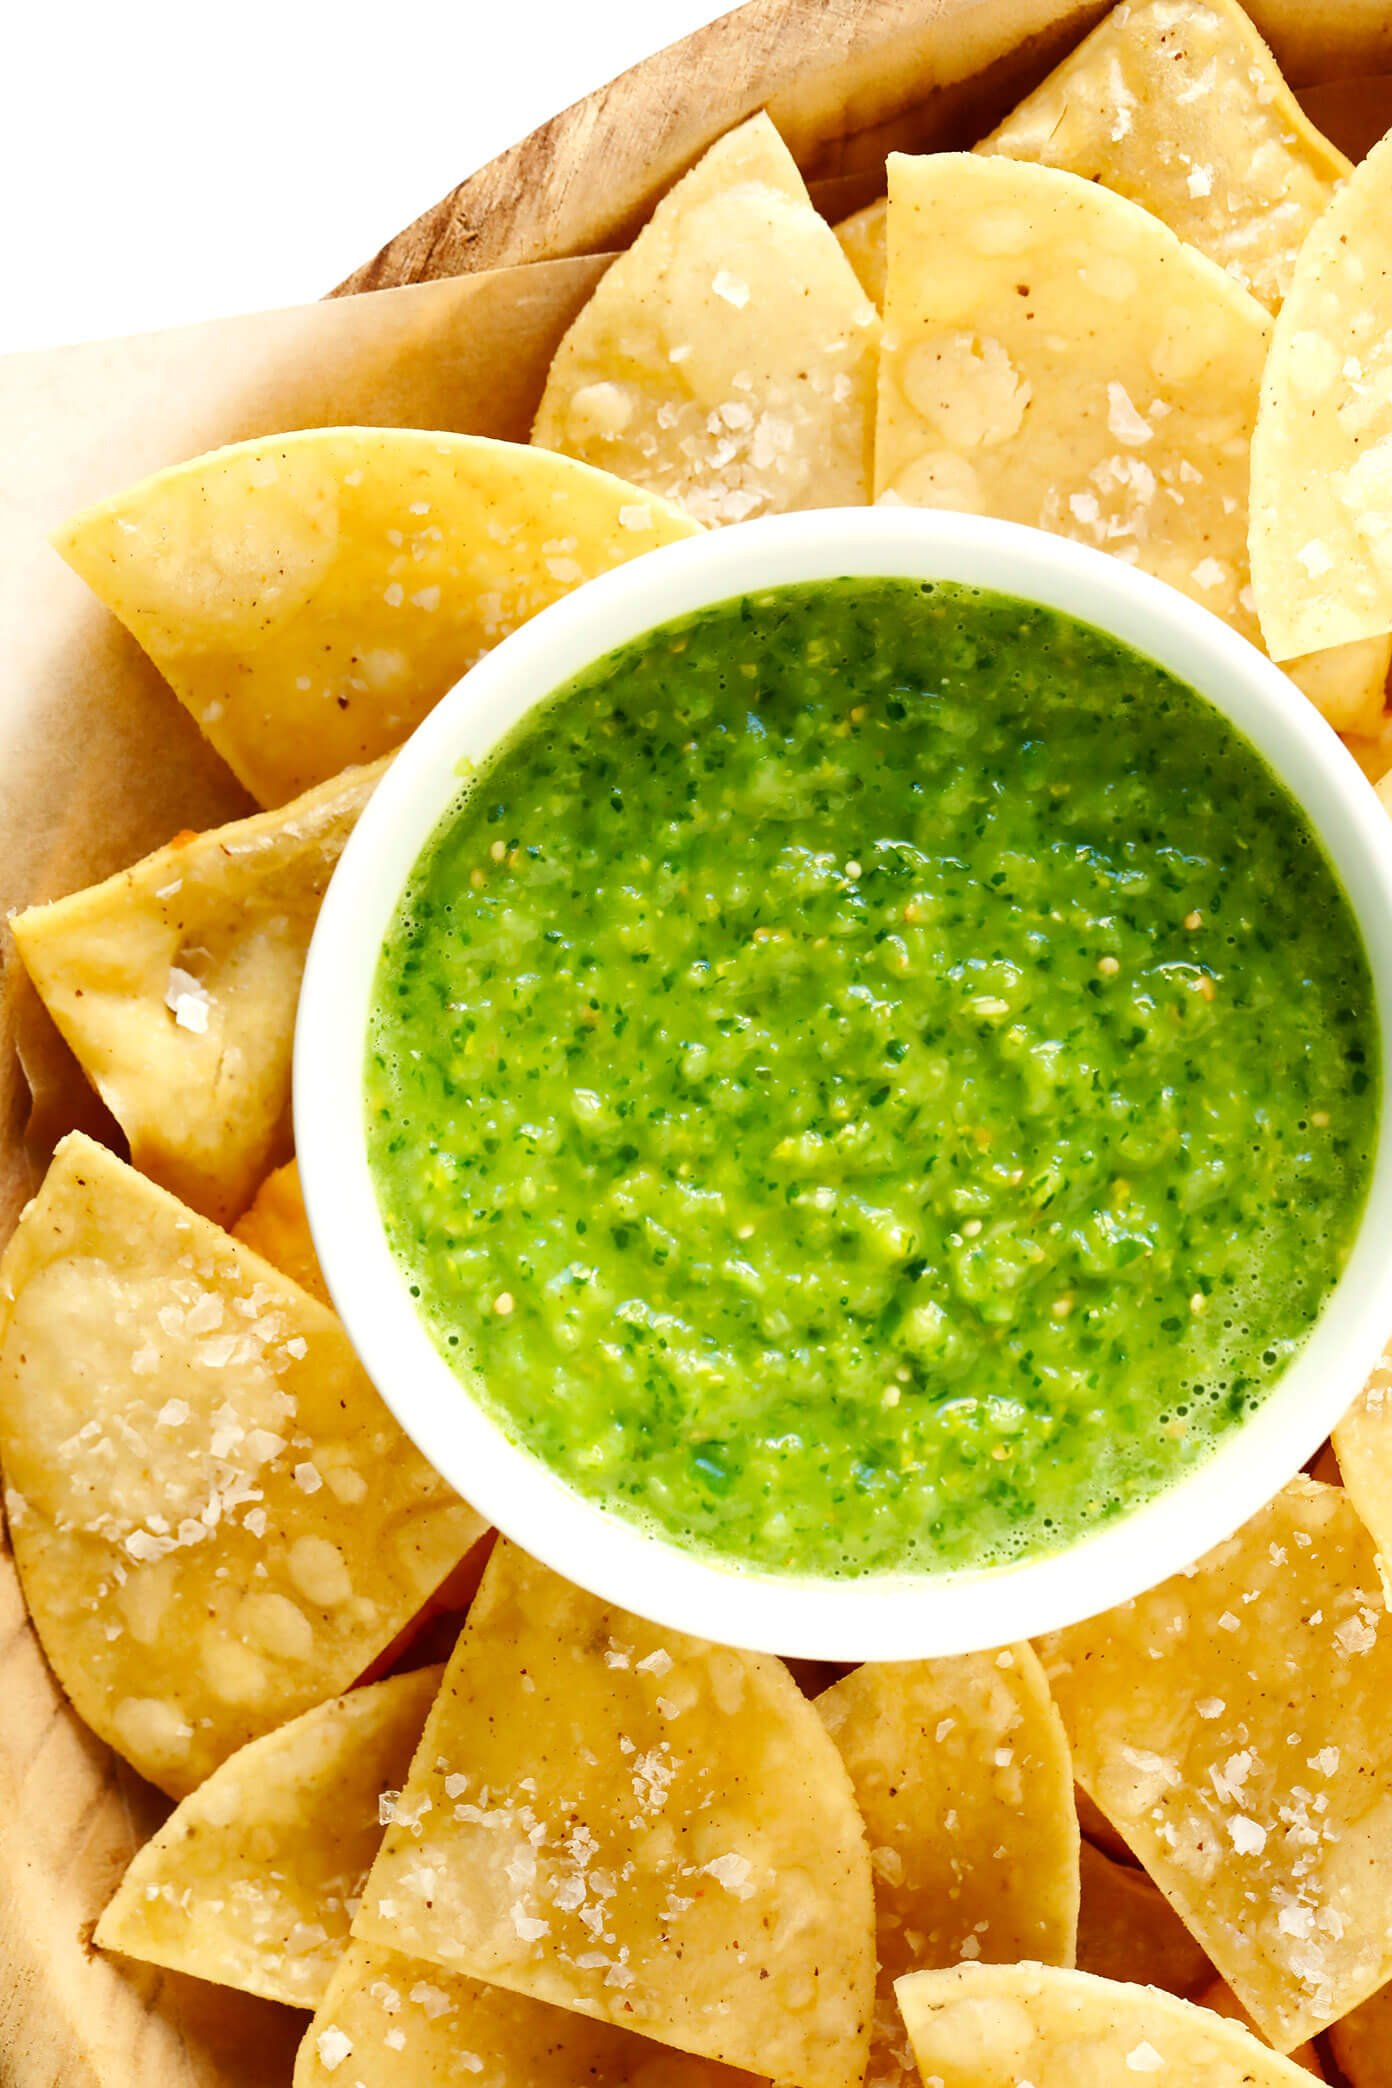 Green Salsa Verde Cruda with Tortilla Chips